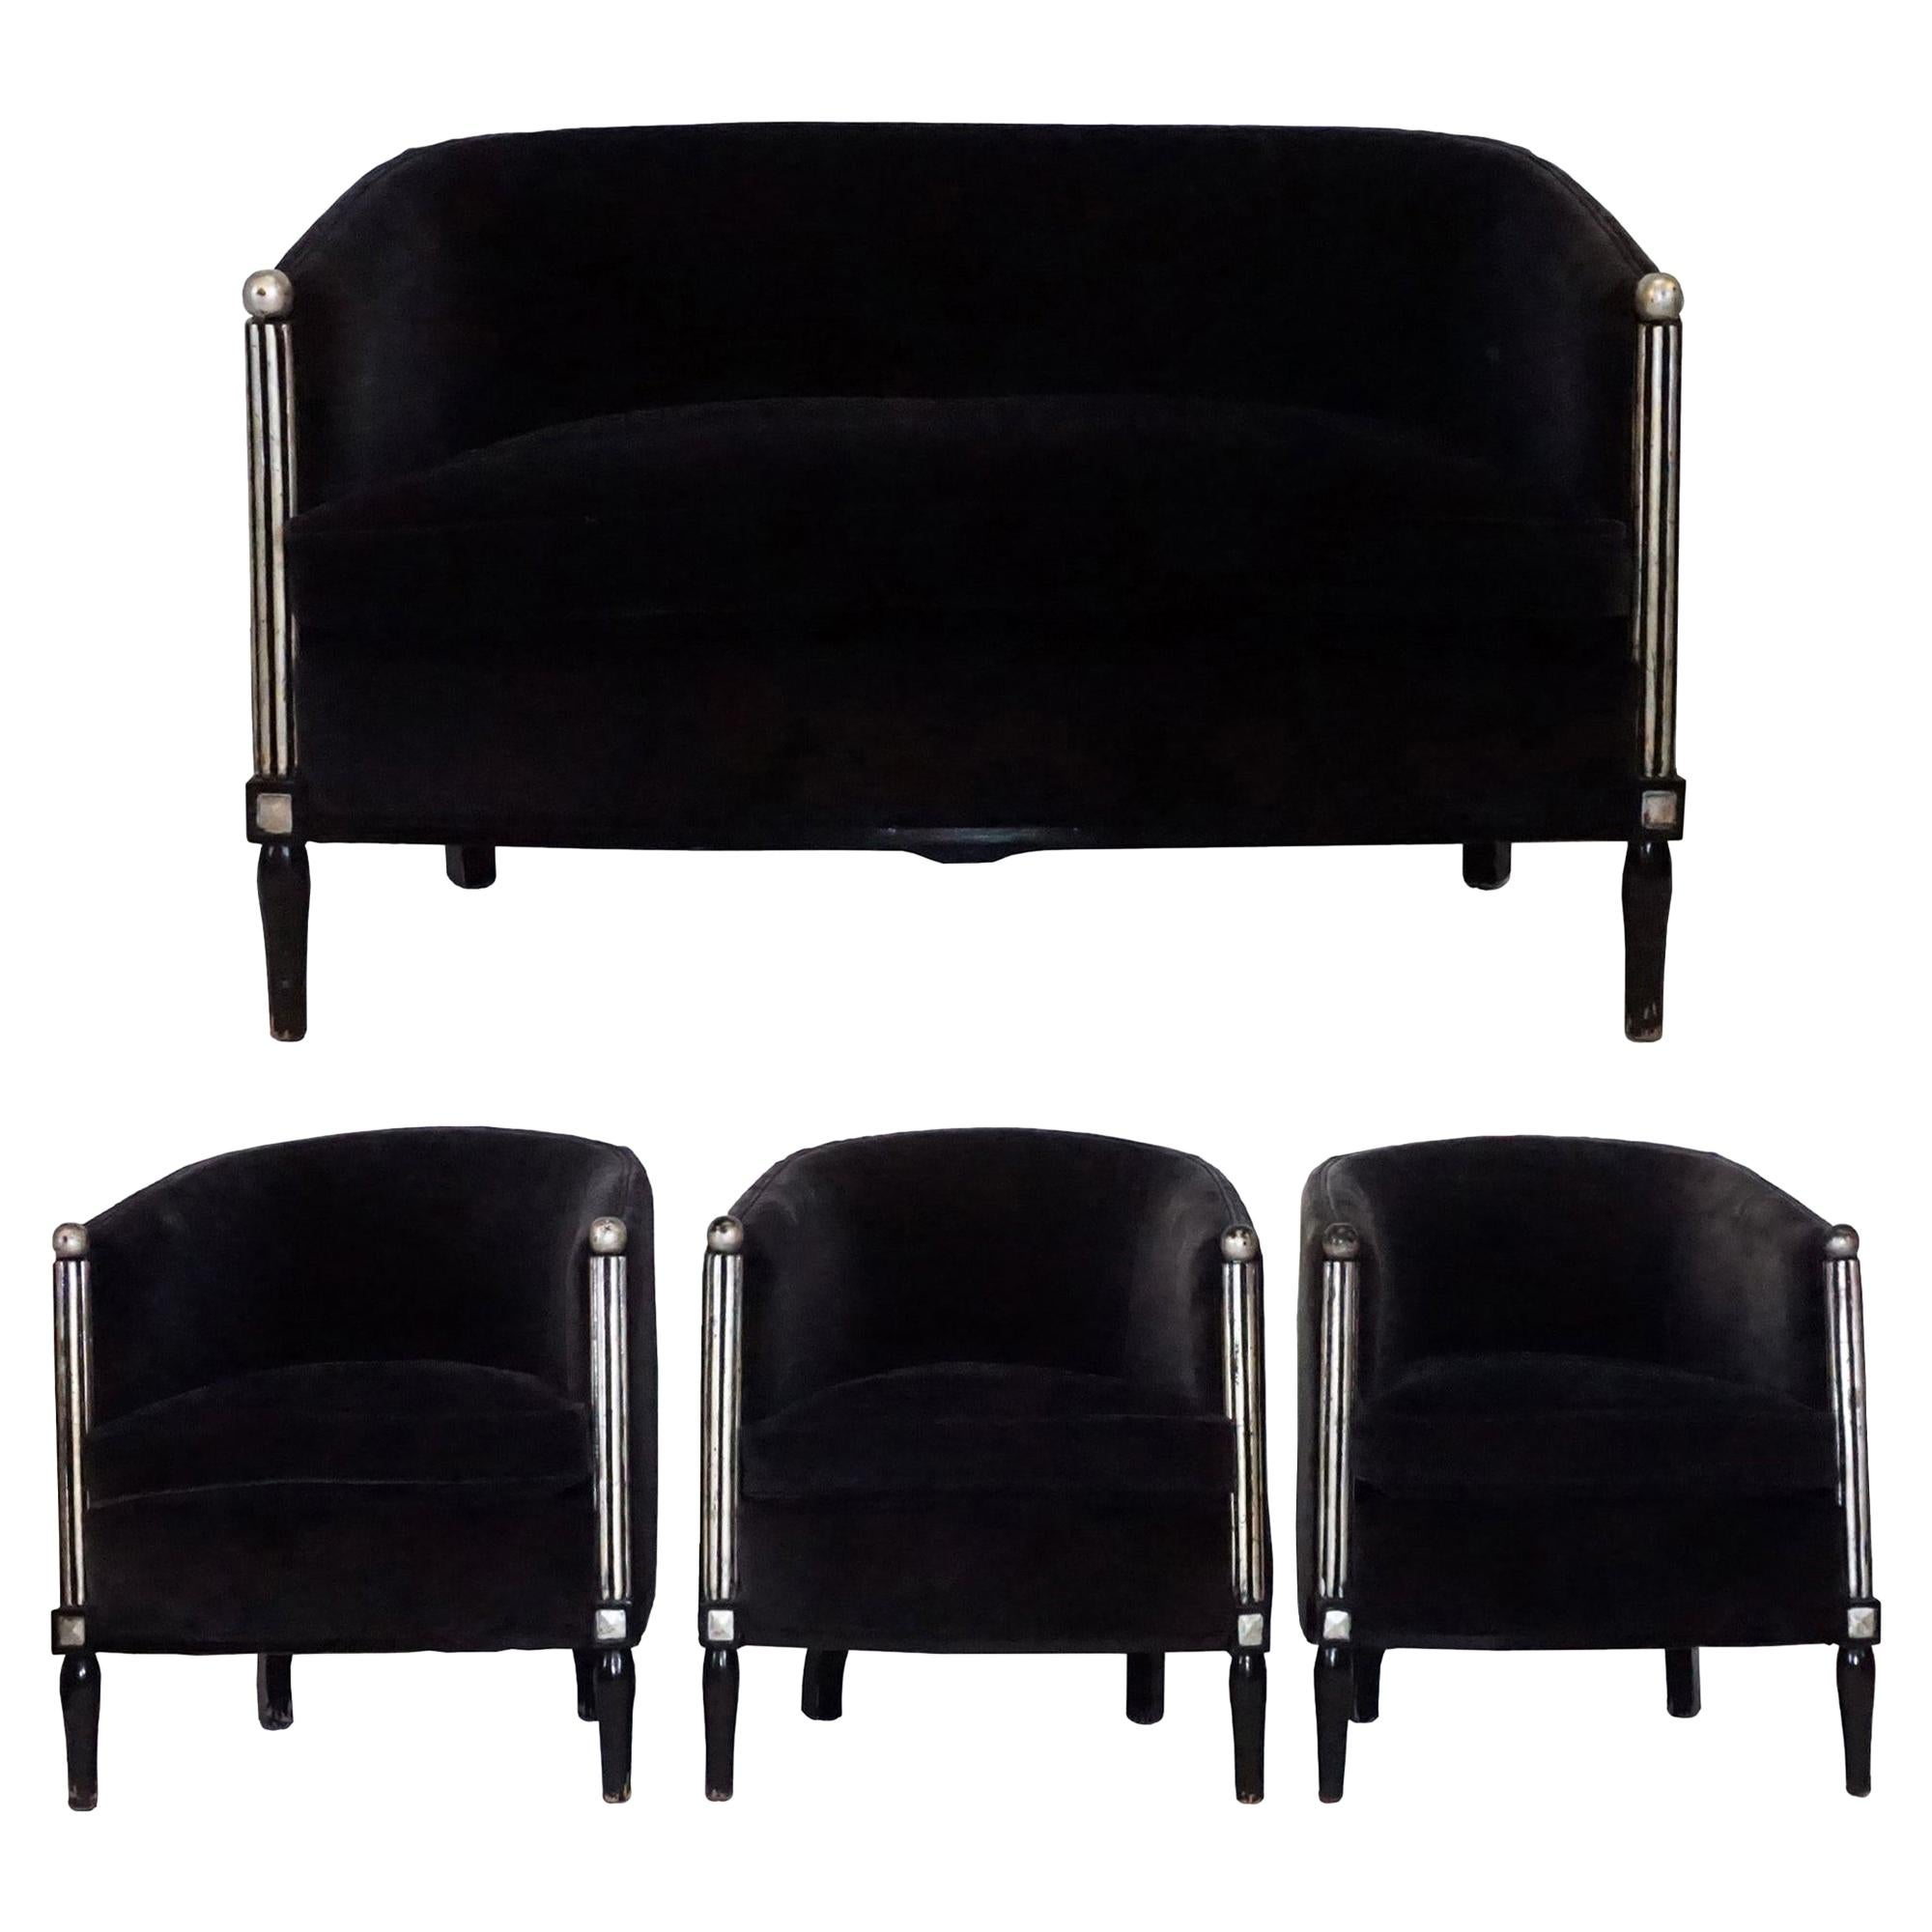 20th Century Parisian Art Deco Living Room Set